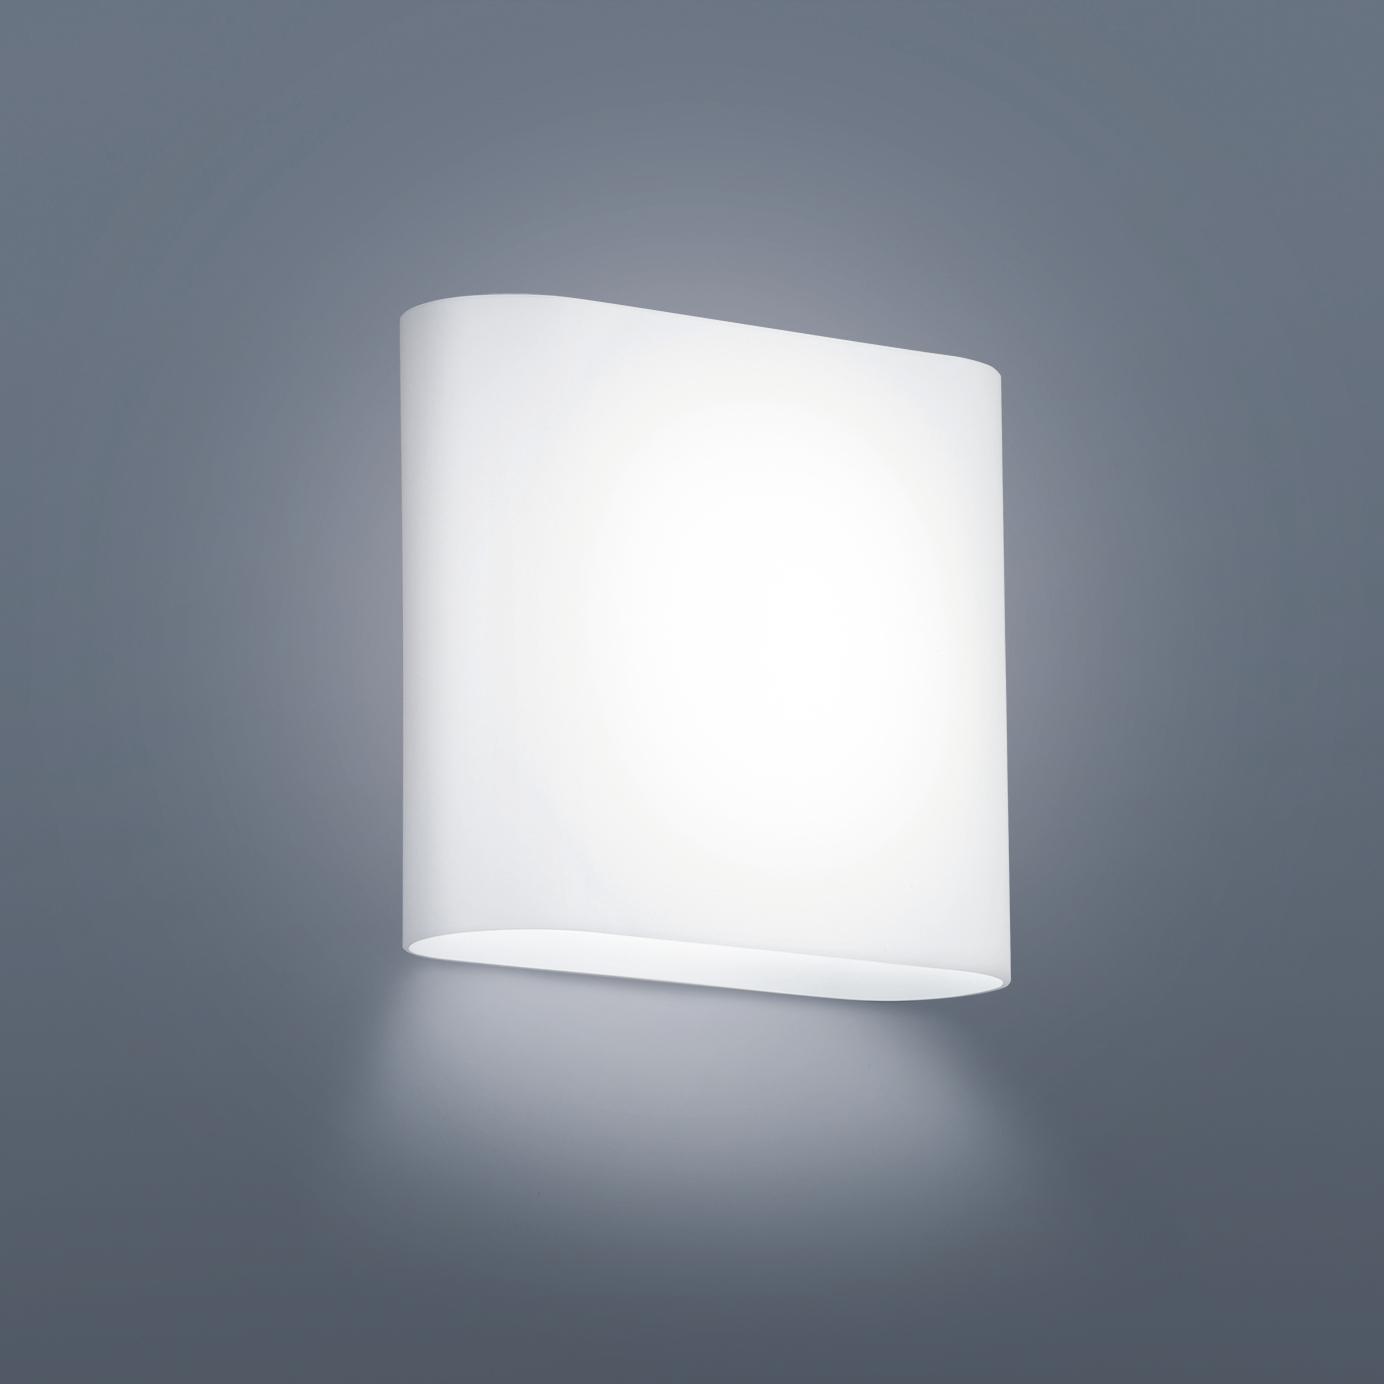 Loop LED Wandleuchte